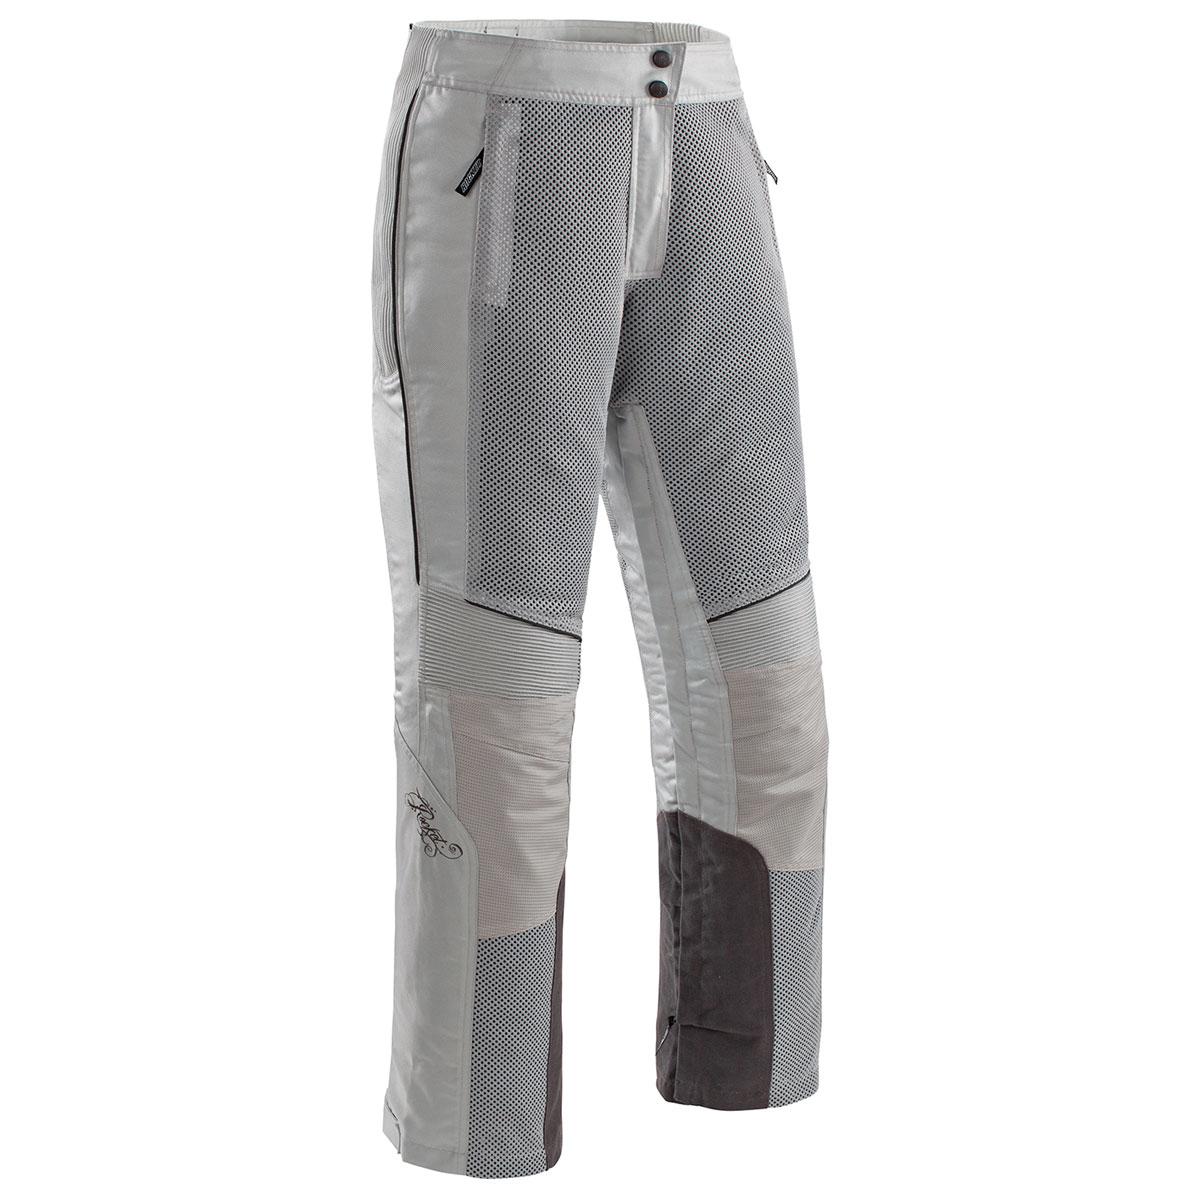 Joe Rocket Women's Cleo Elite Mesh Silver Pants